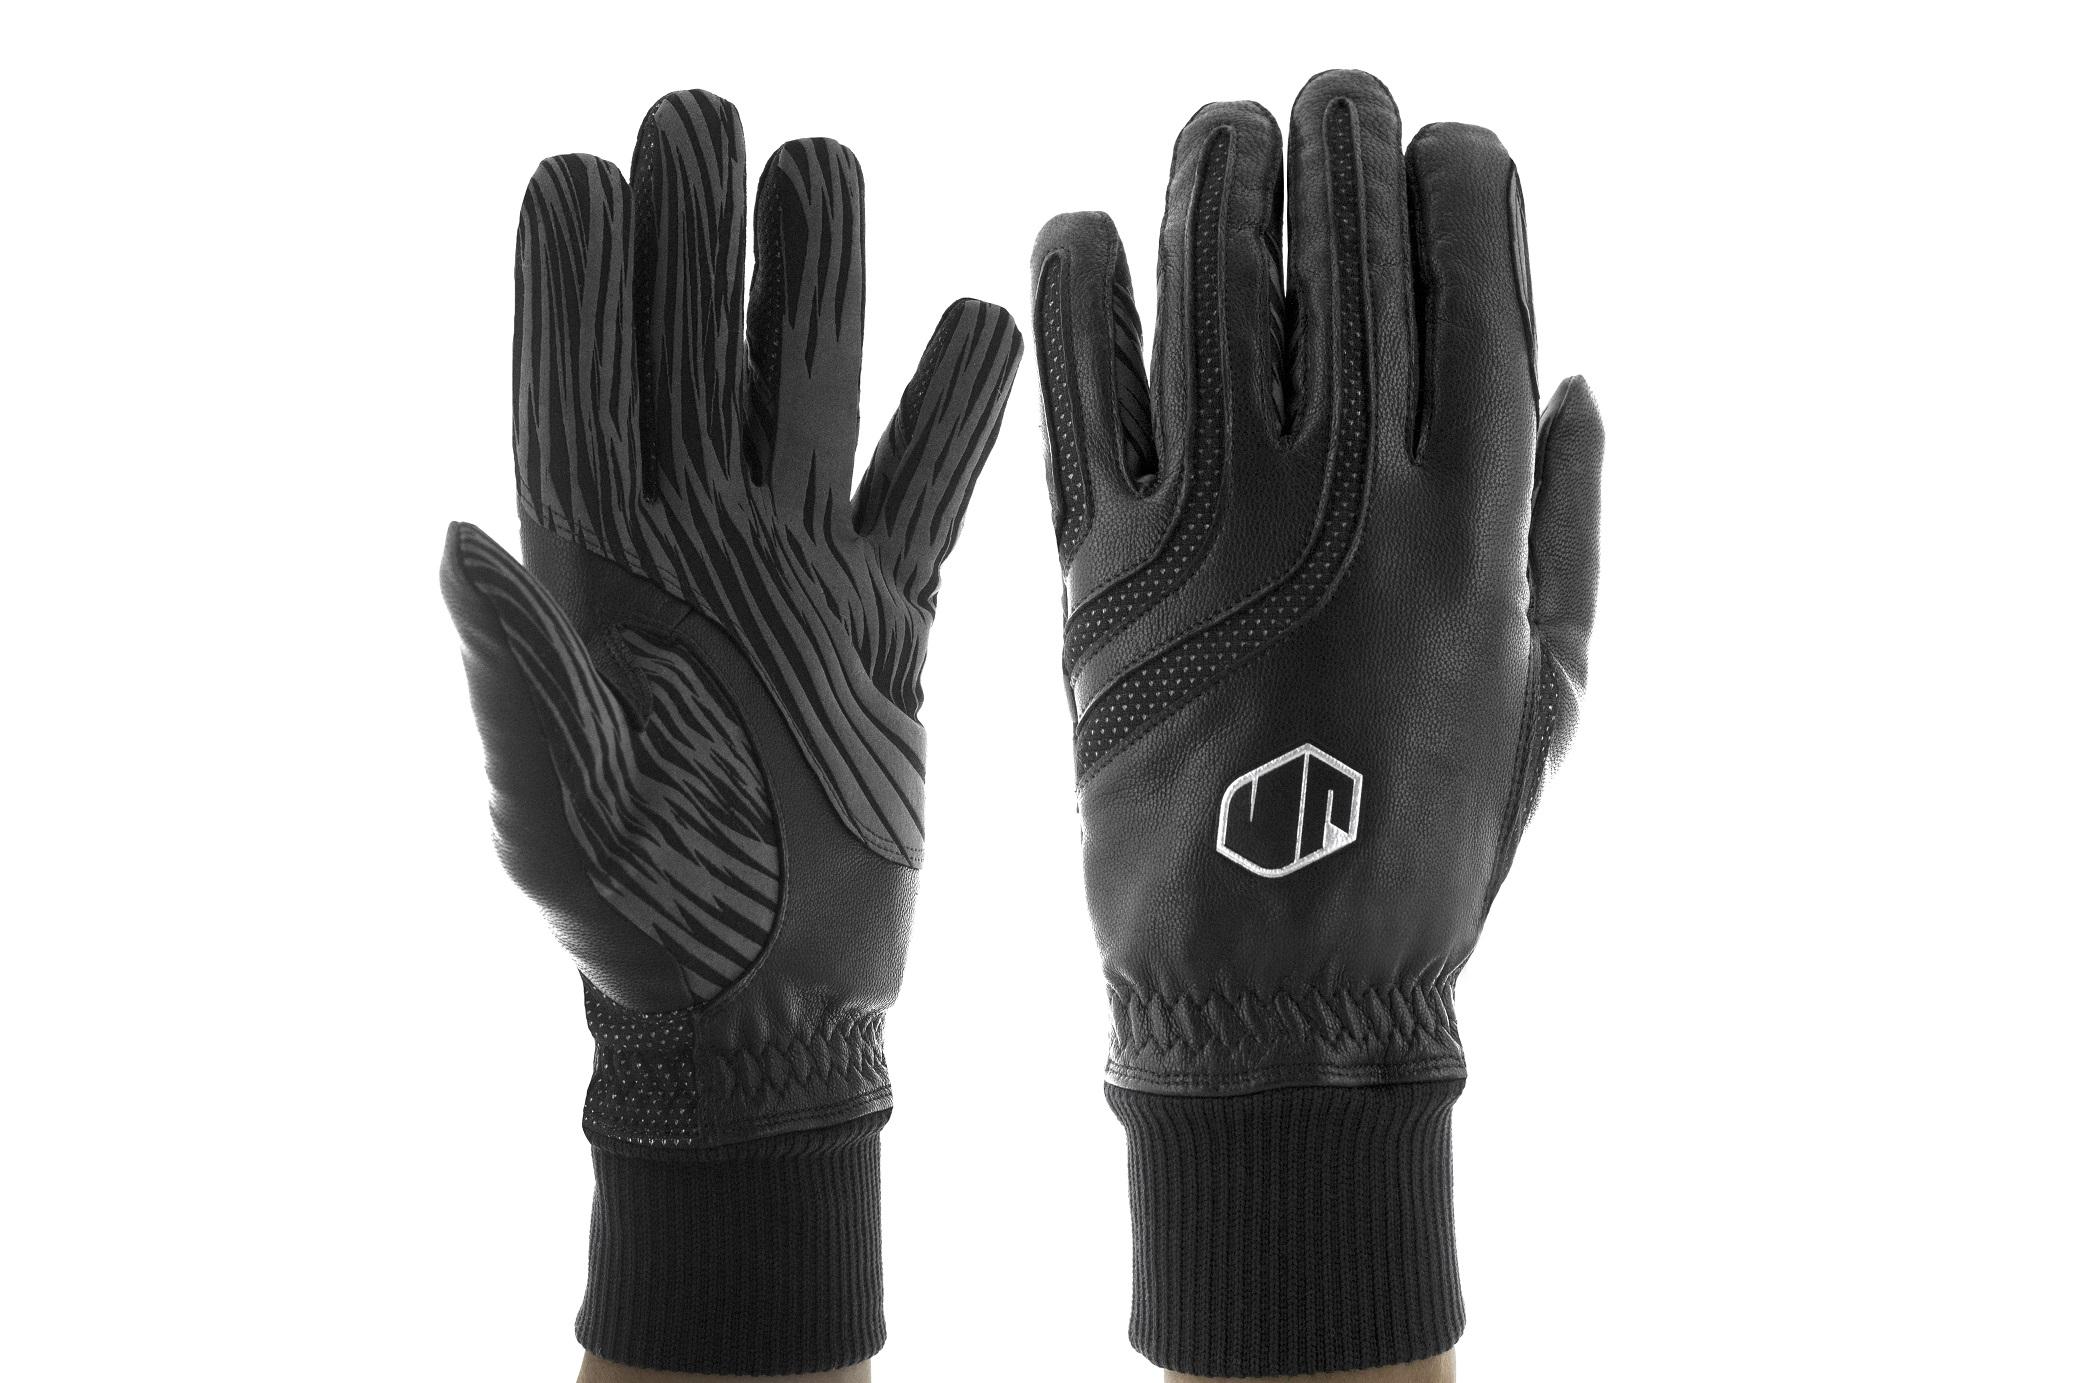 W-Skin_gloves_Samshield